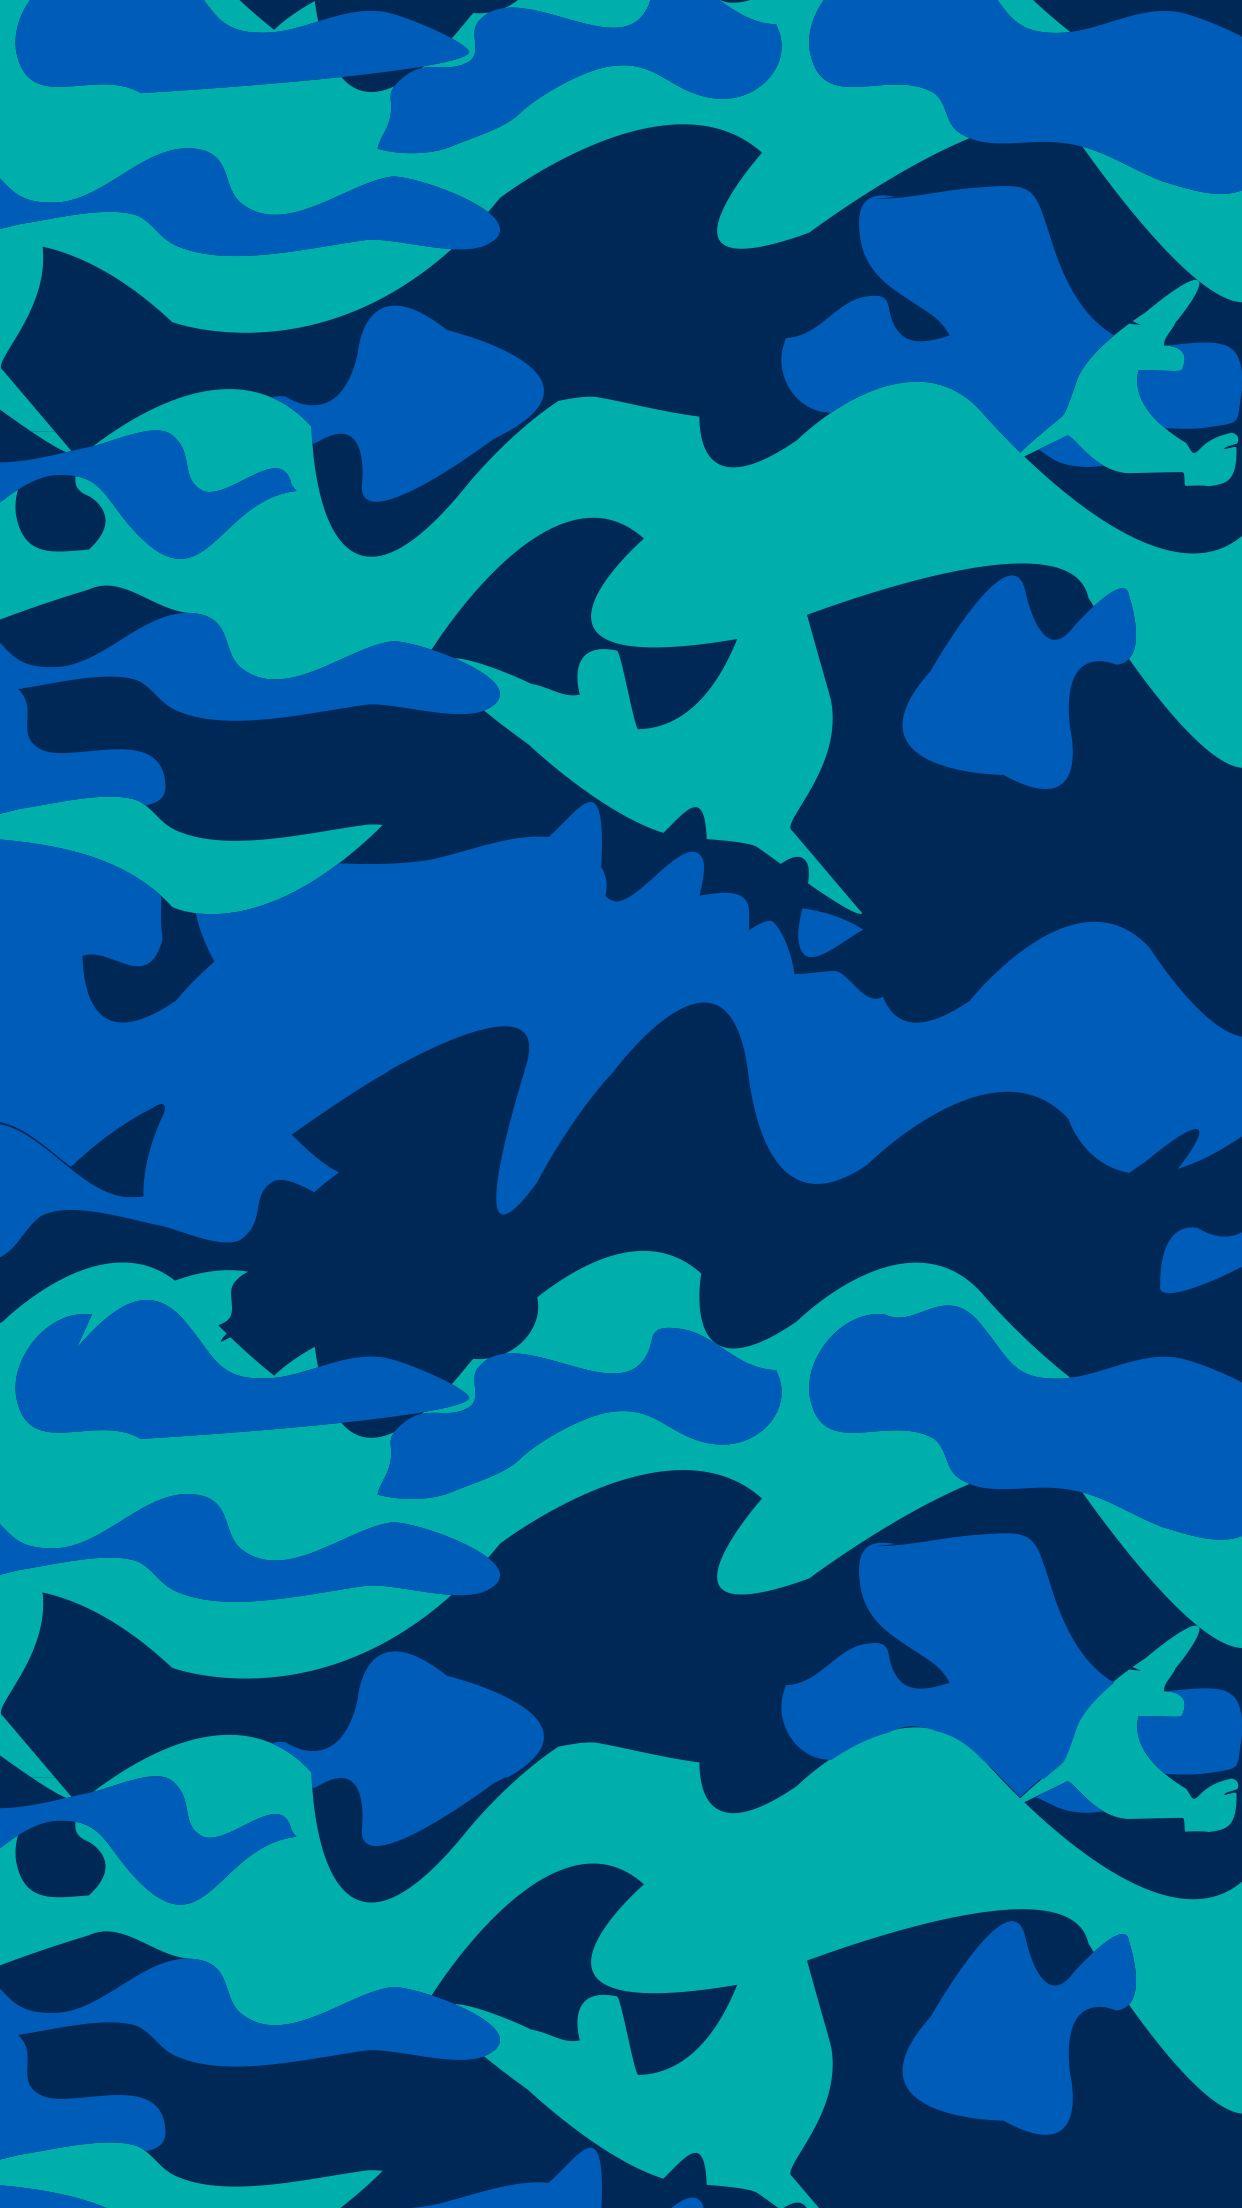 Bape Camo Wallpaper   Data-src /img/73604 - Phone Bape Camo Wallpaper Hd - HD Wallpaper